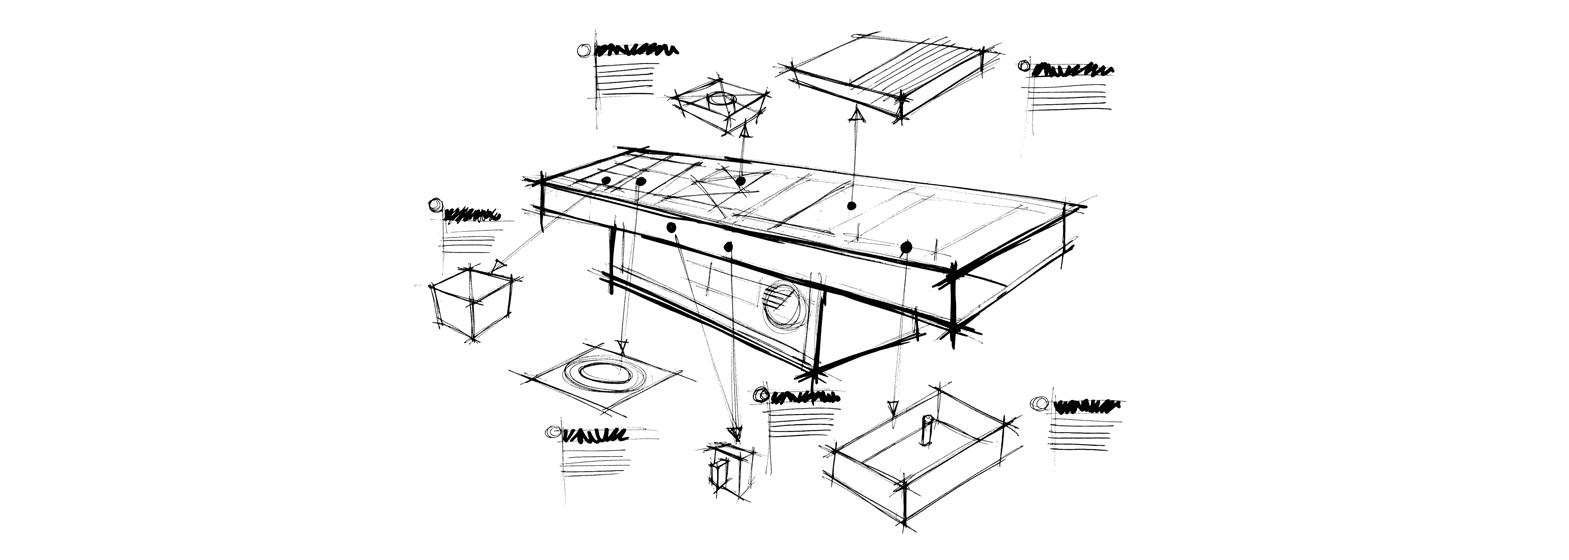 Tavolo Cucina Misure Standard cucina industriale su misura - cucine professionali su